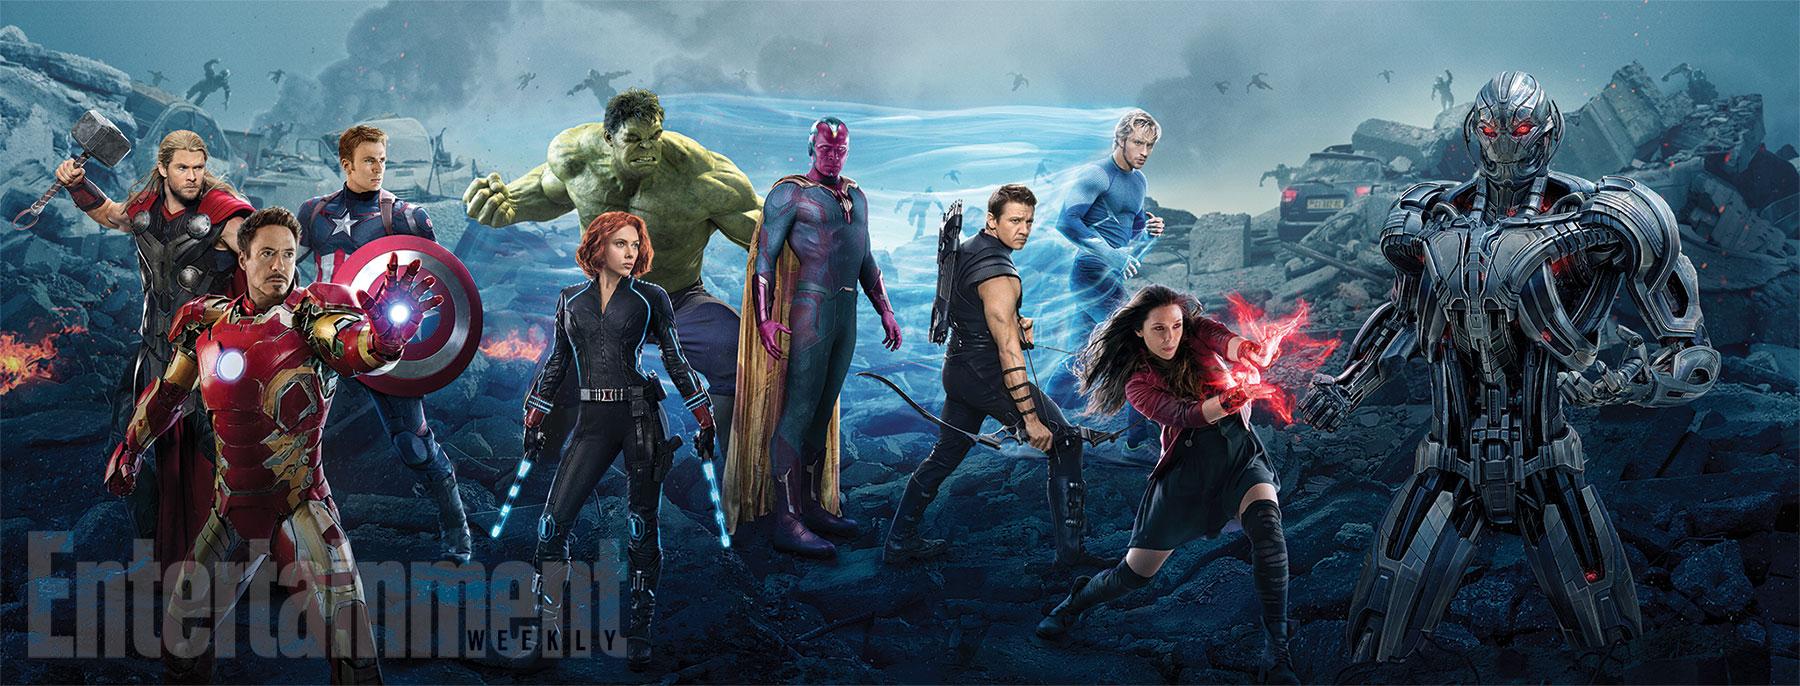 avengers-age-of-ultron-ew